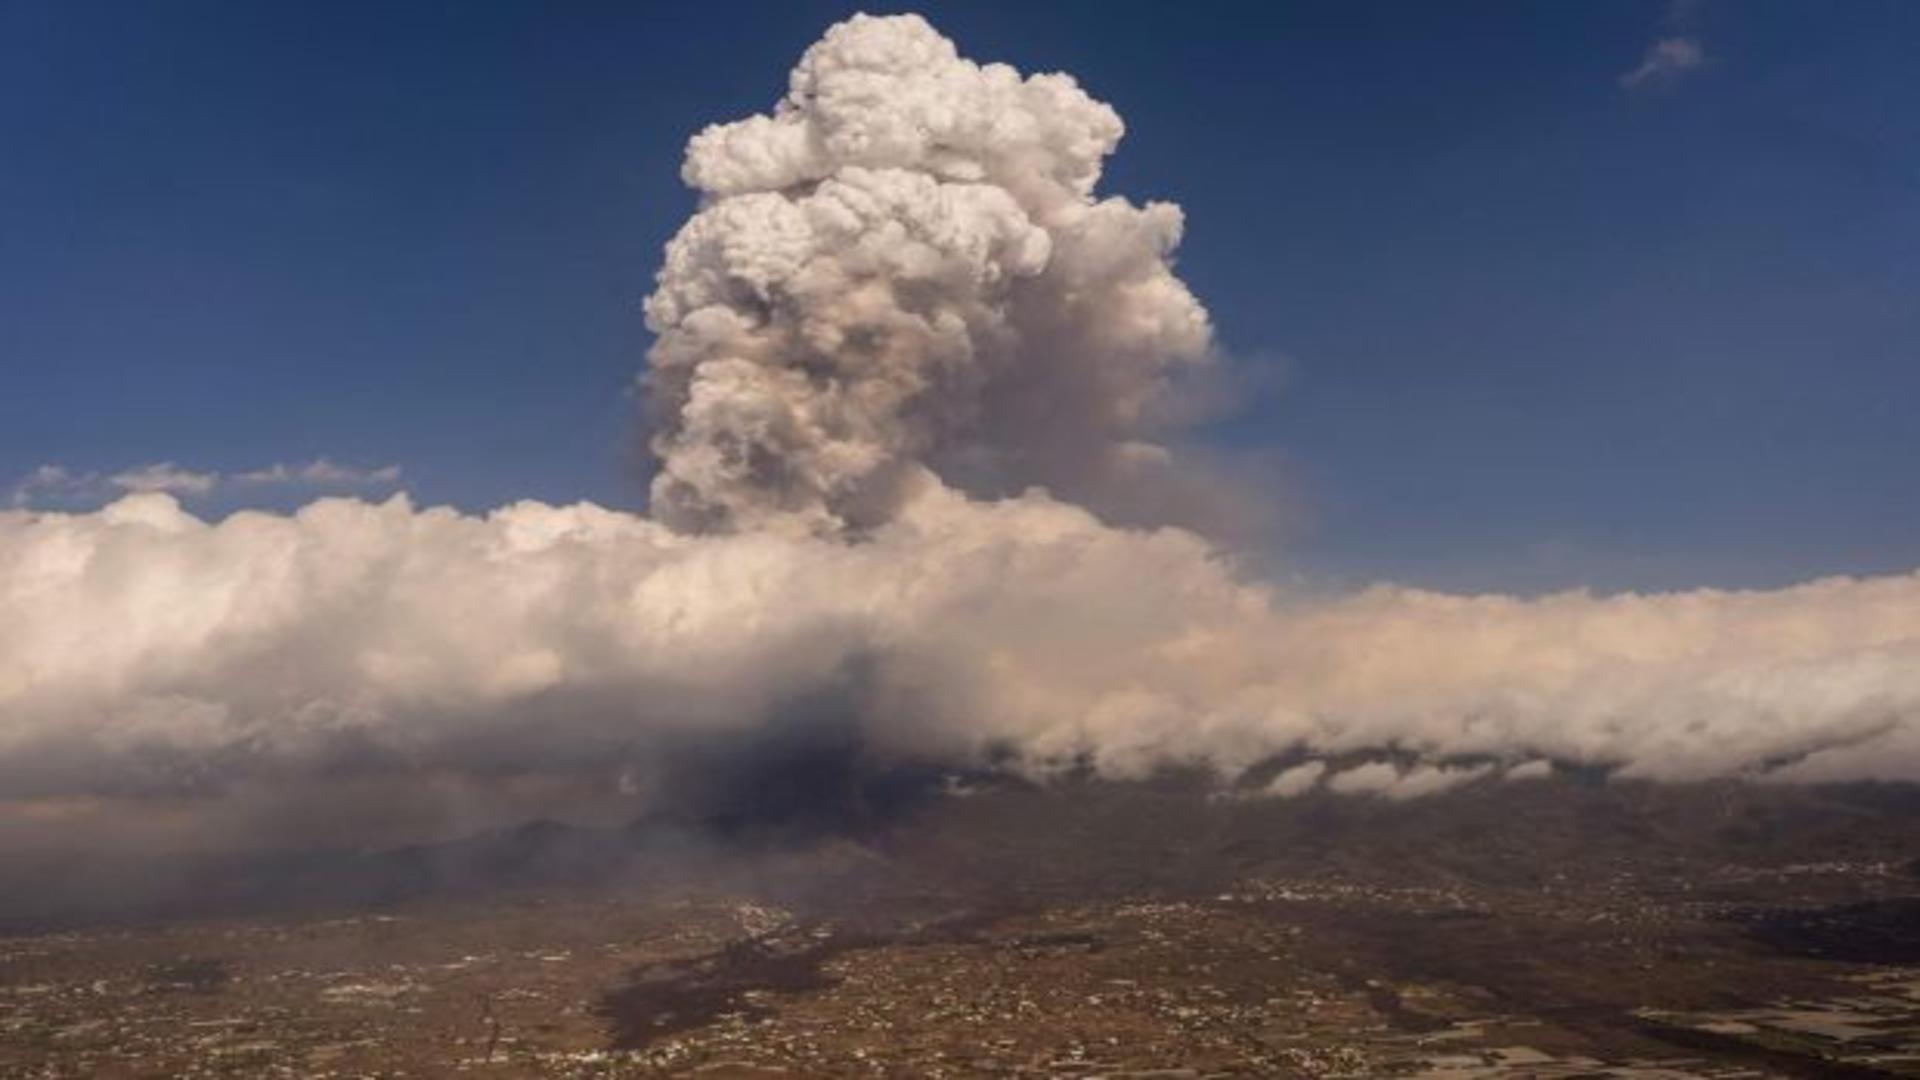 meteorologii-avertizeaza-pericol-pe-cerul-rom